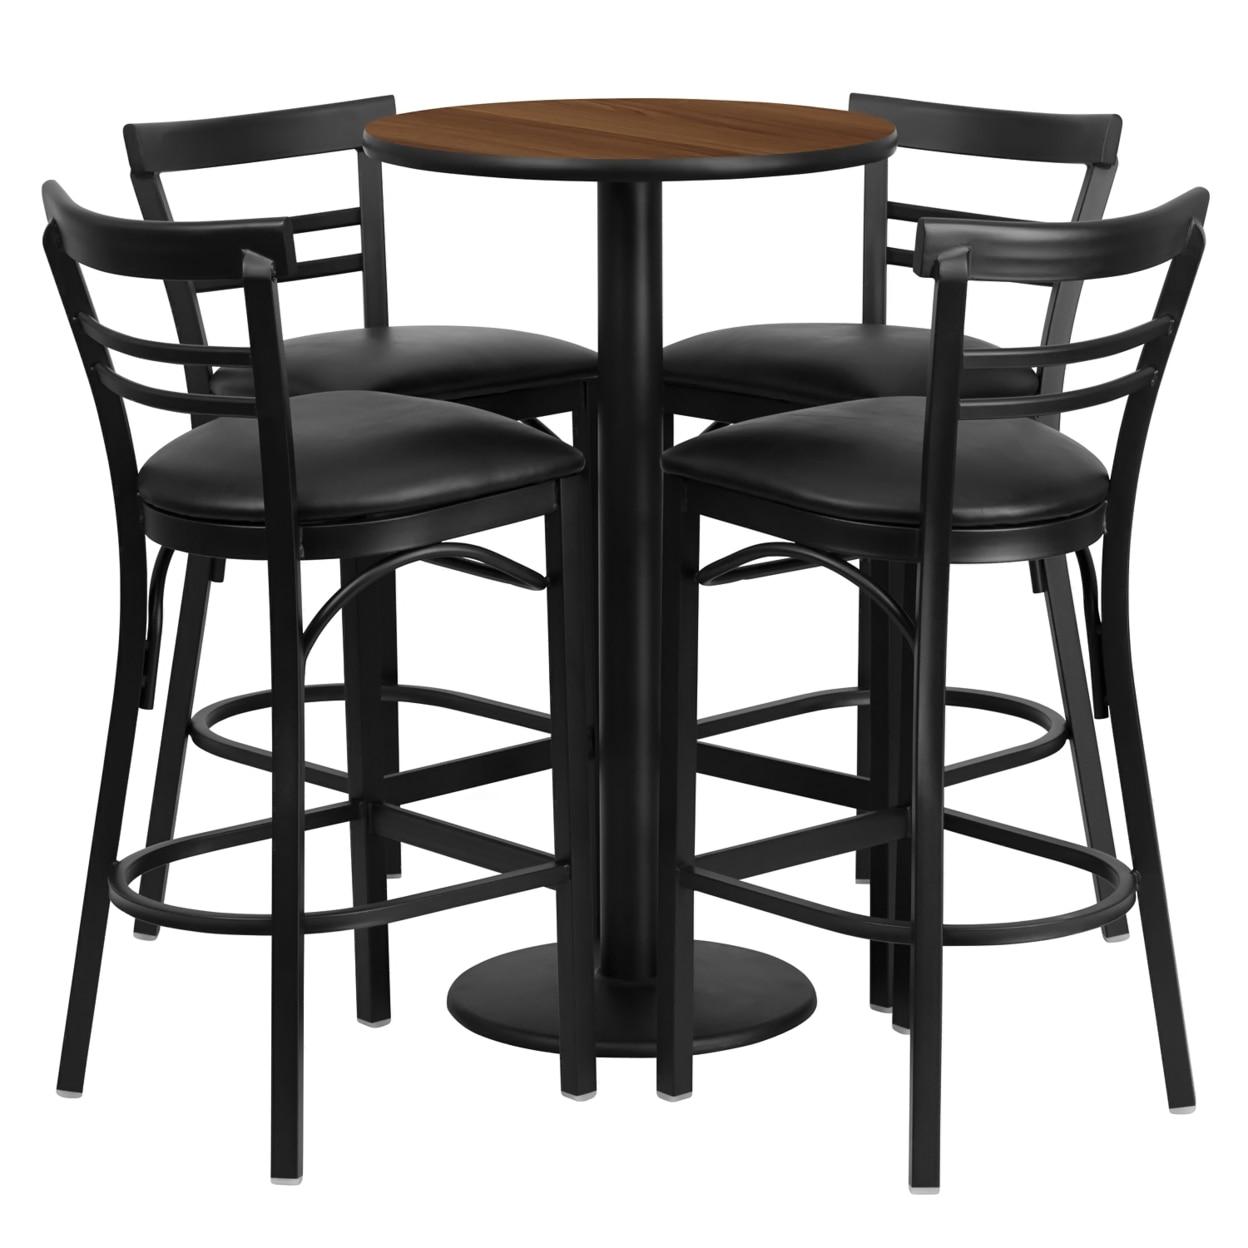 все цены на Flash Furniture 24'' Round Walnut Laminate Table Set with 4 Ladder Back Bar Stools - Black Vinyl Seat [863-RSRB1036-GG]